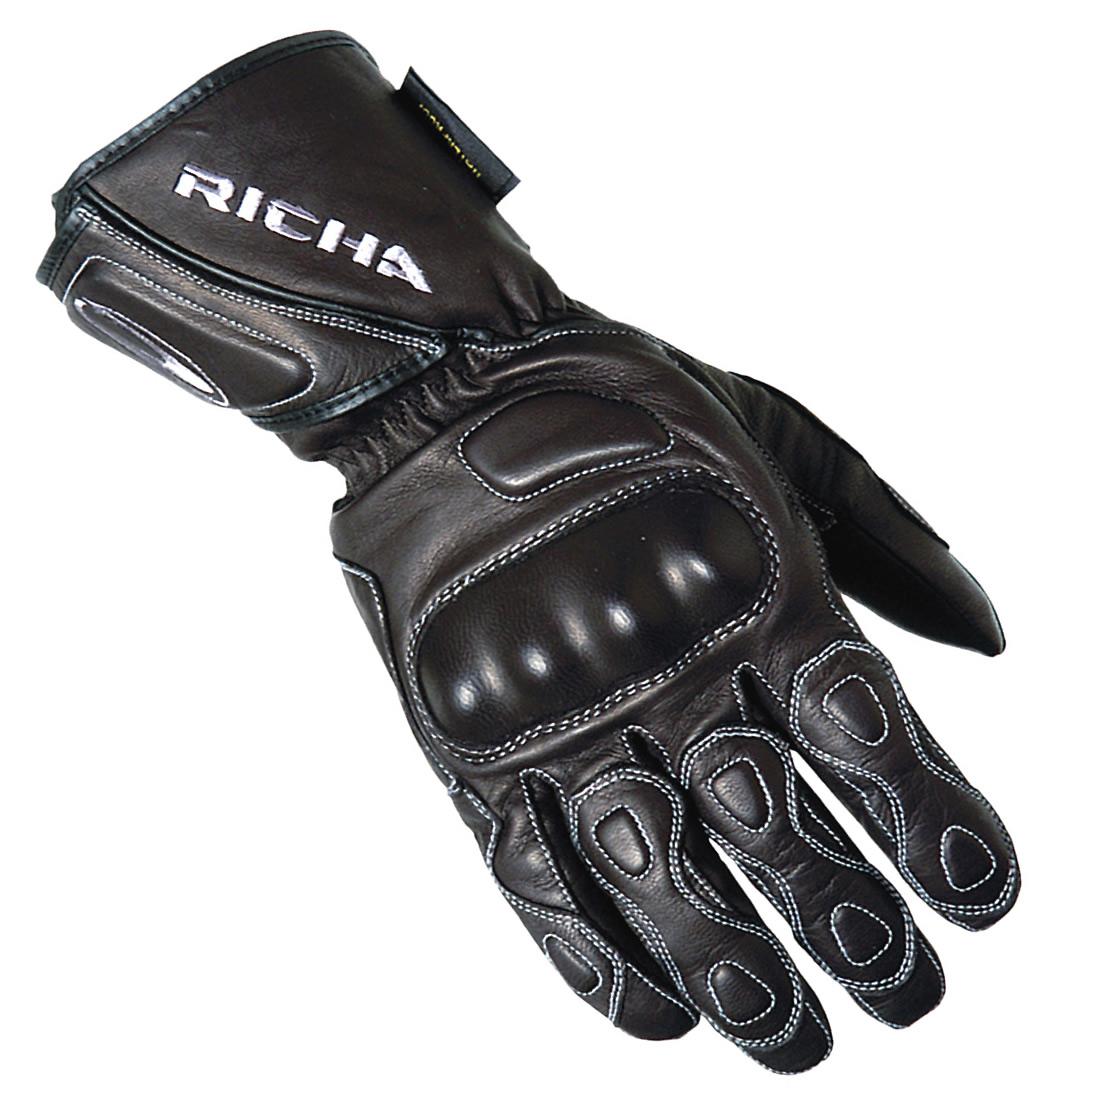 Motorcycle leather gloves waterproof - Richa Wp Racing Ladies Motorcycle Leather Gloves Womens